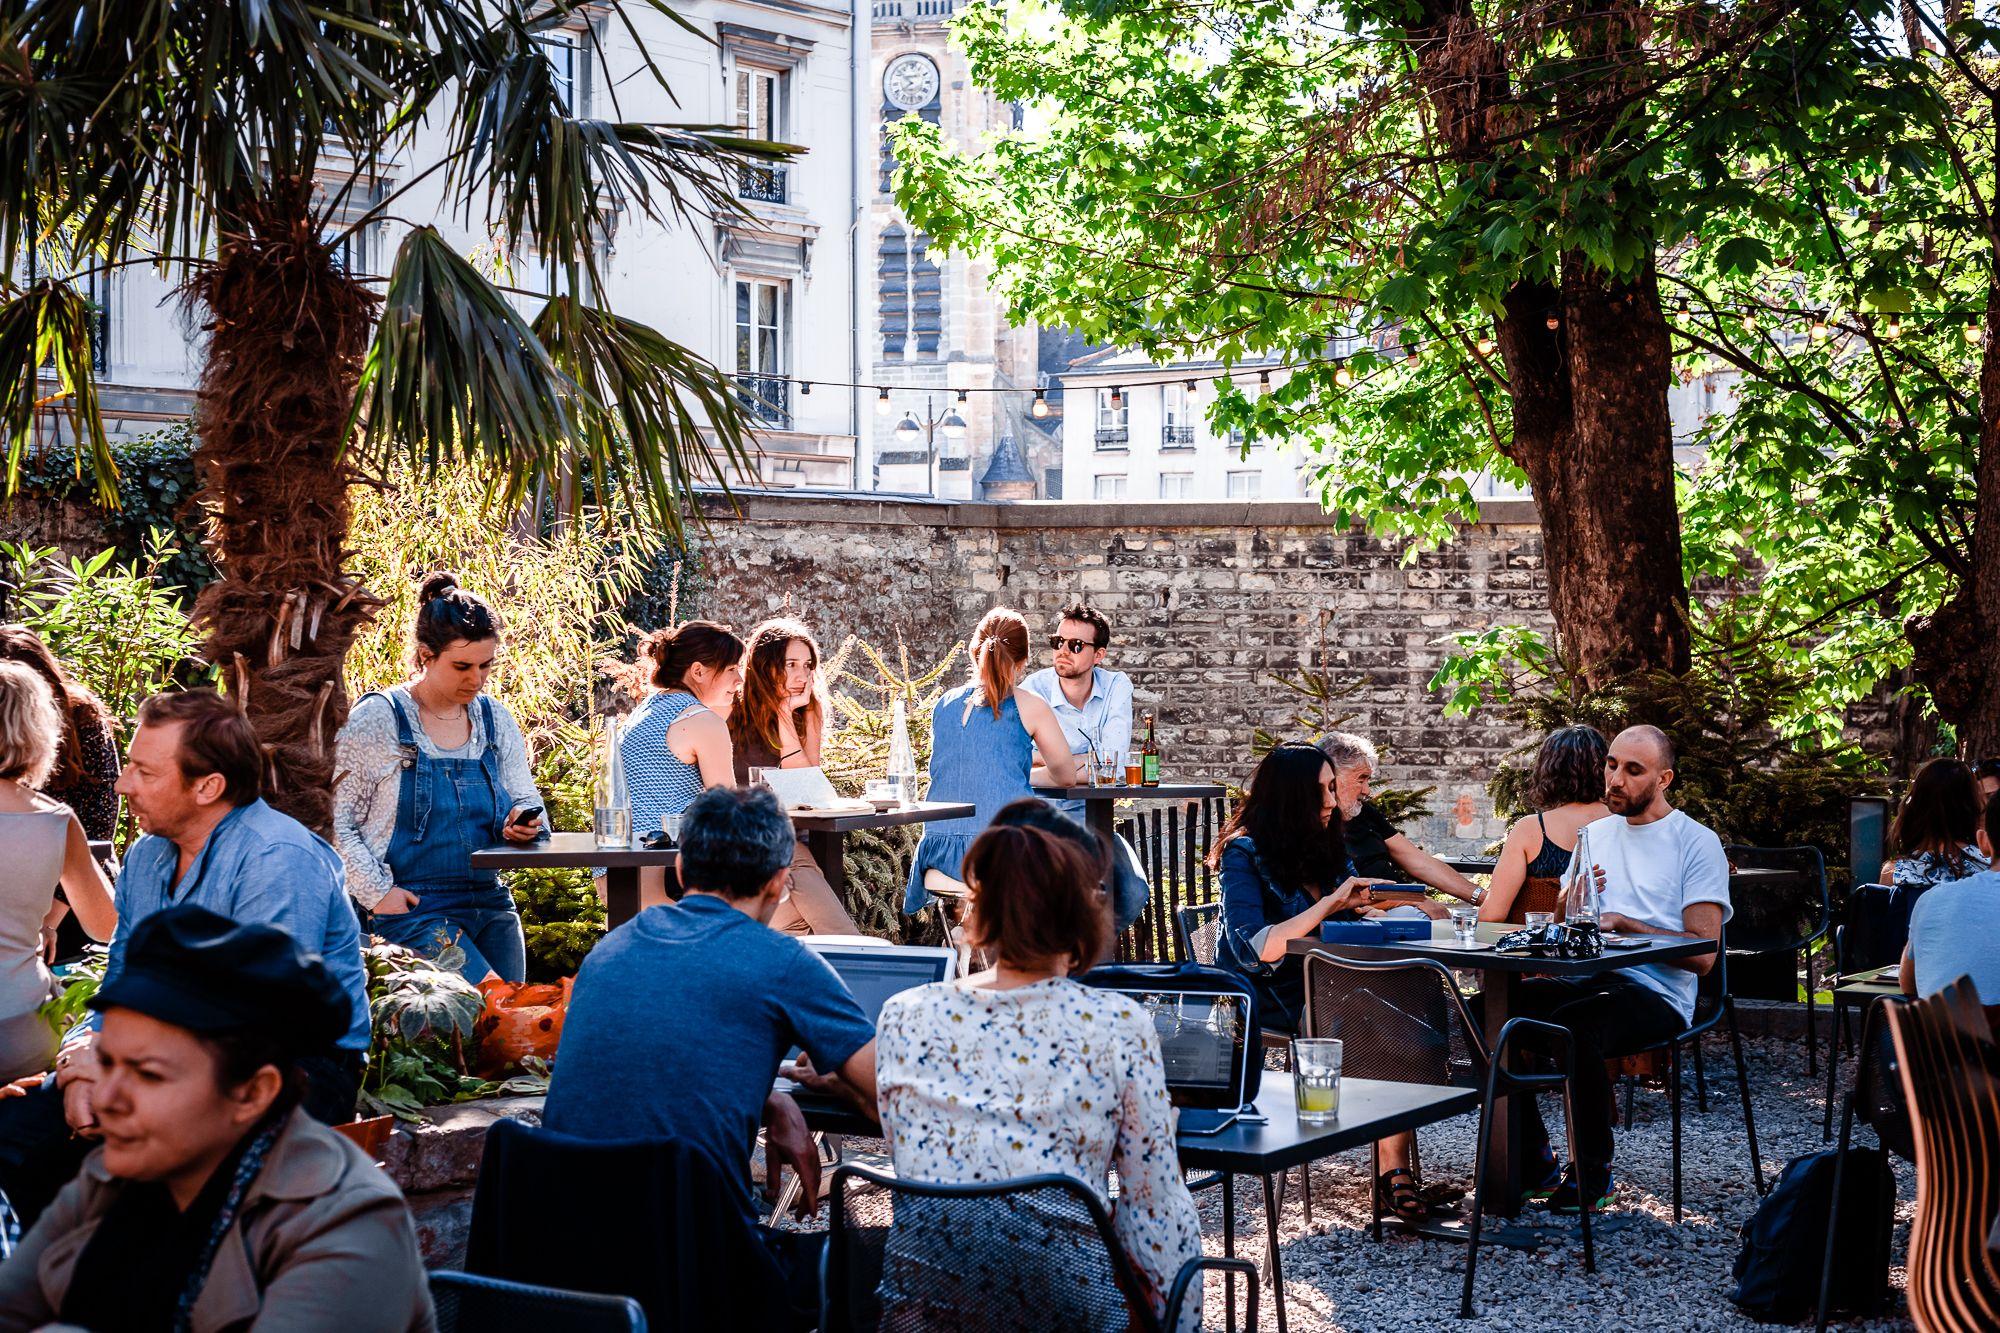 Terrasse Canal Saint Martin café a i la terrasse i gare de l'est i canal st martin i